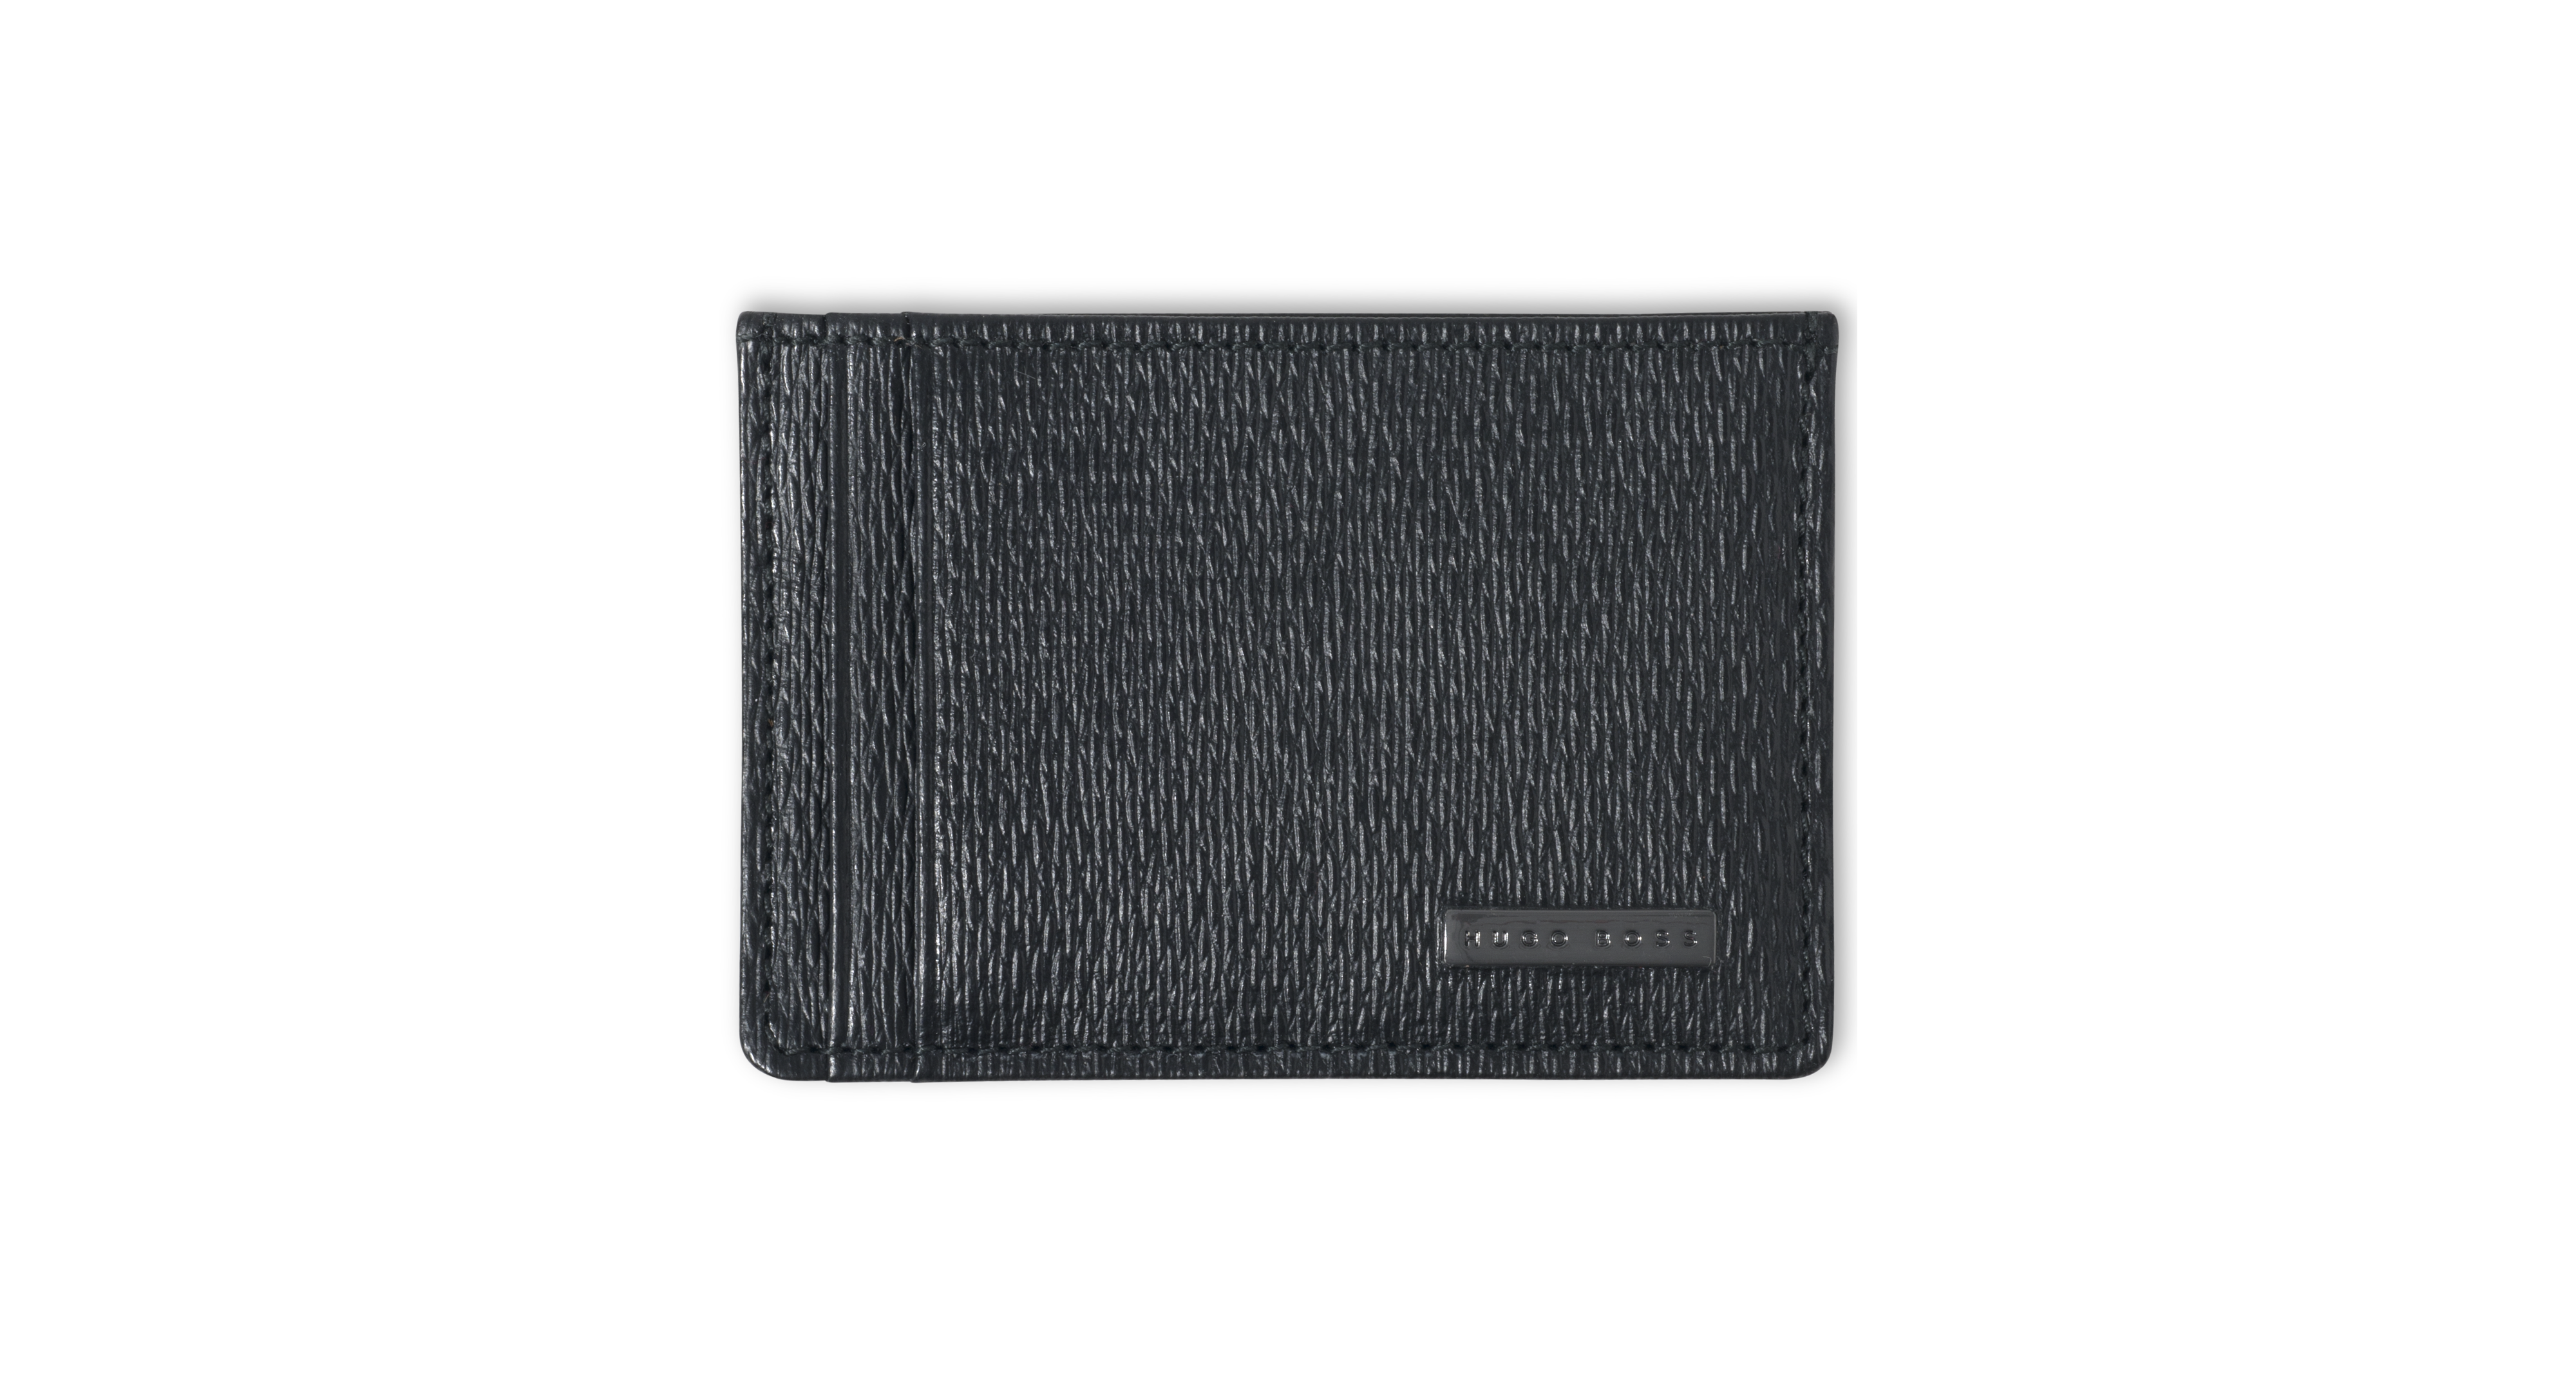 Hugo Boss Card Holder Wallet – The Best Wallet 2017